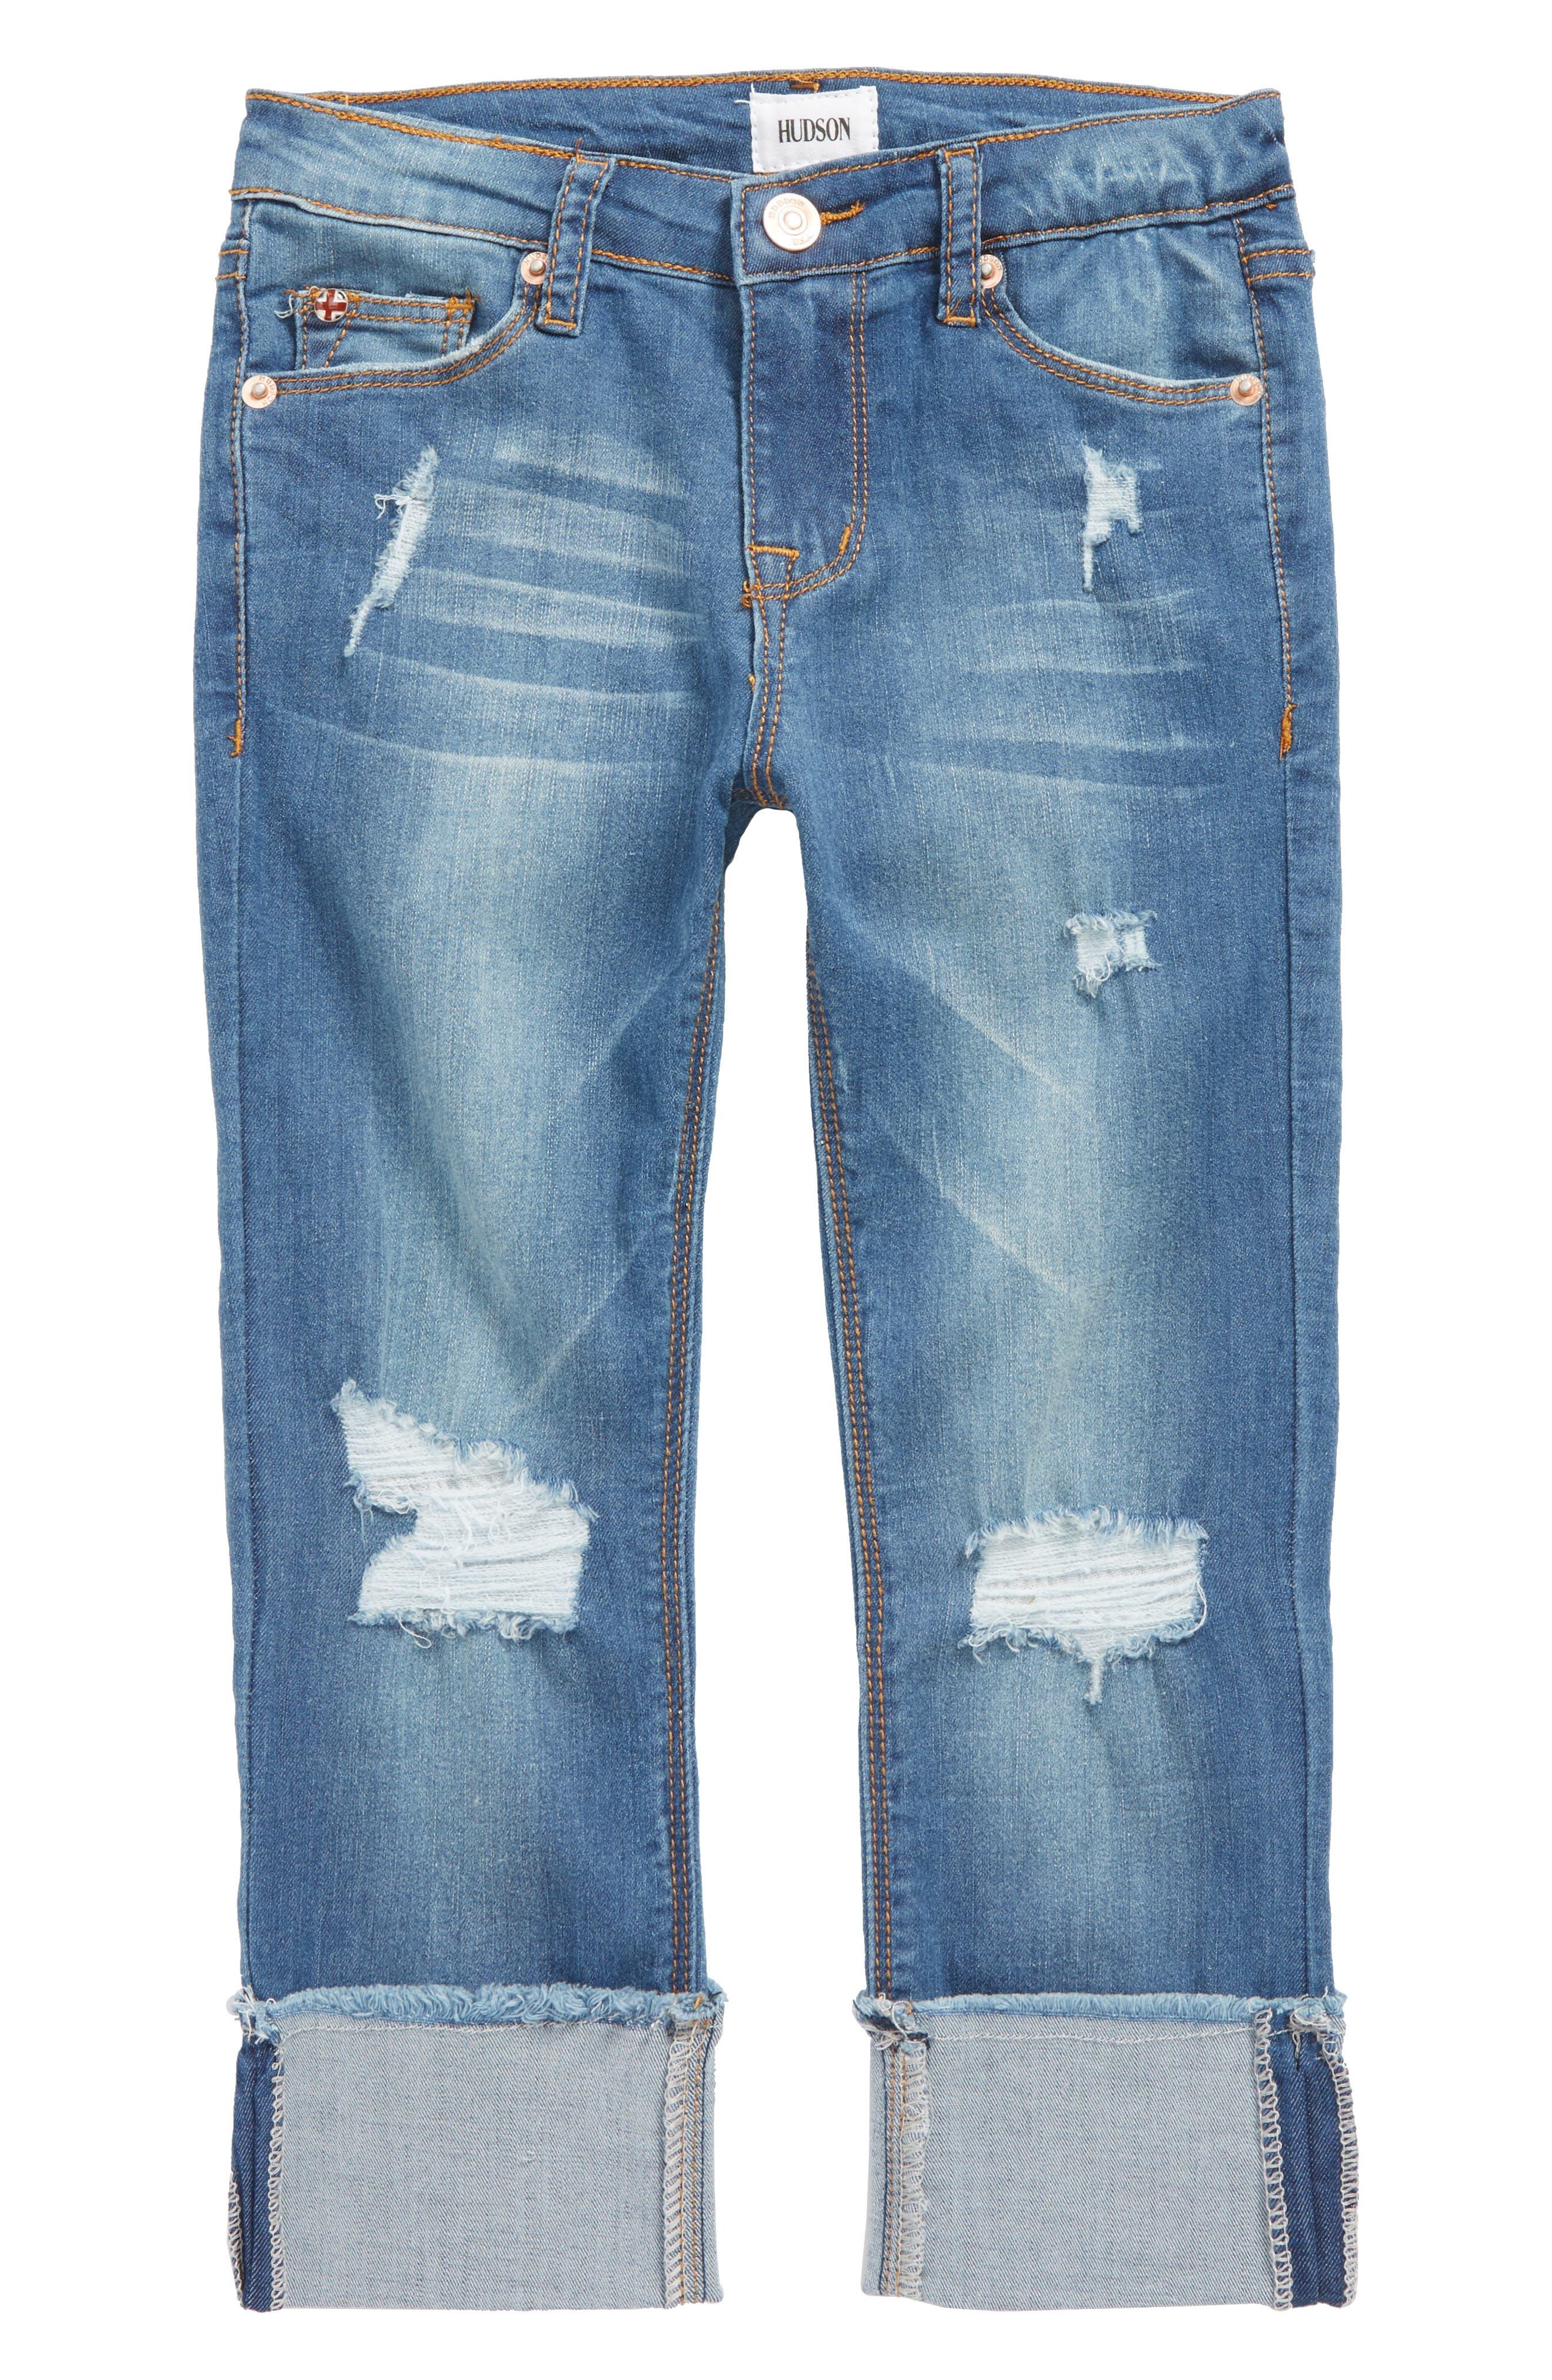 Jessa Crop Skinny Jeans,                             Main thumbnail 1, color,                             499